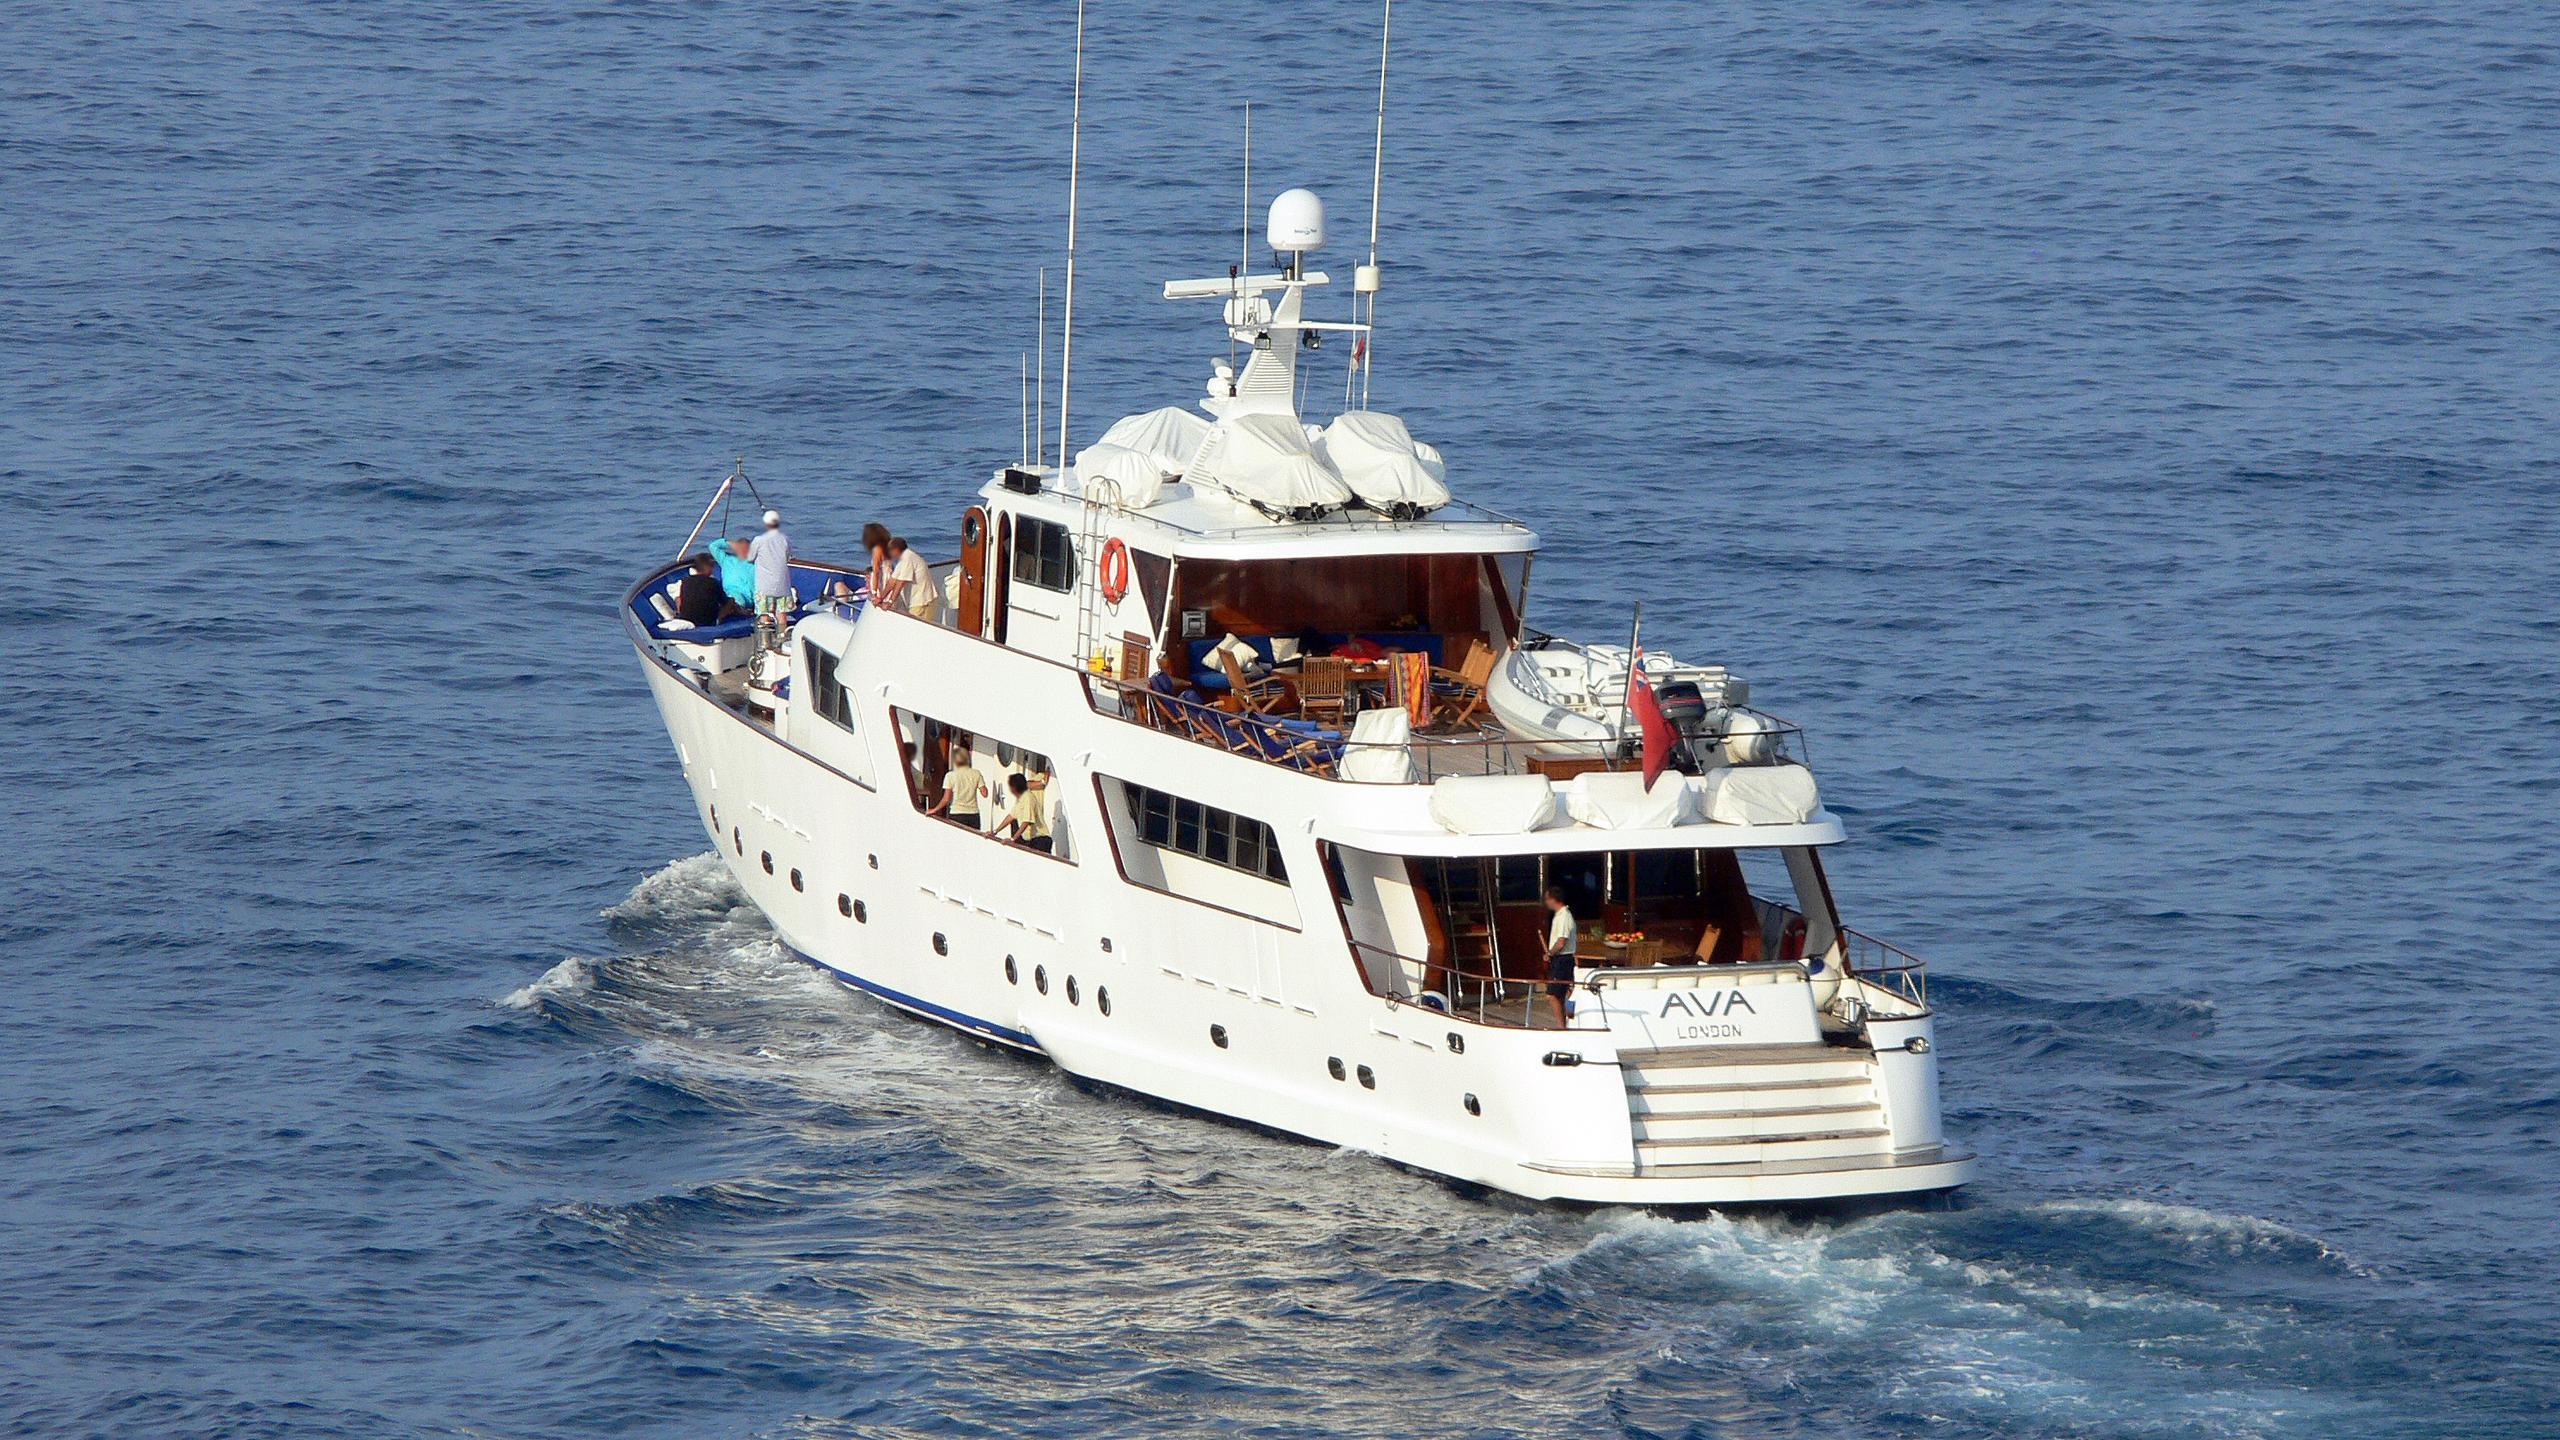 ava-motor-yacht-crn-1976-40m-stern-cruising